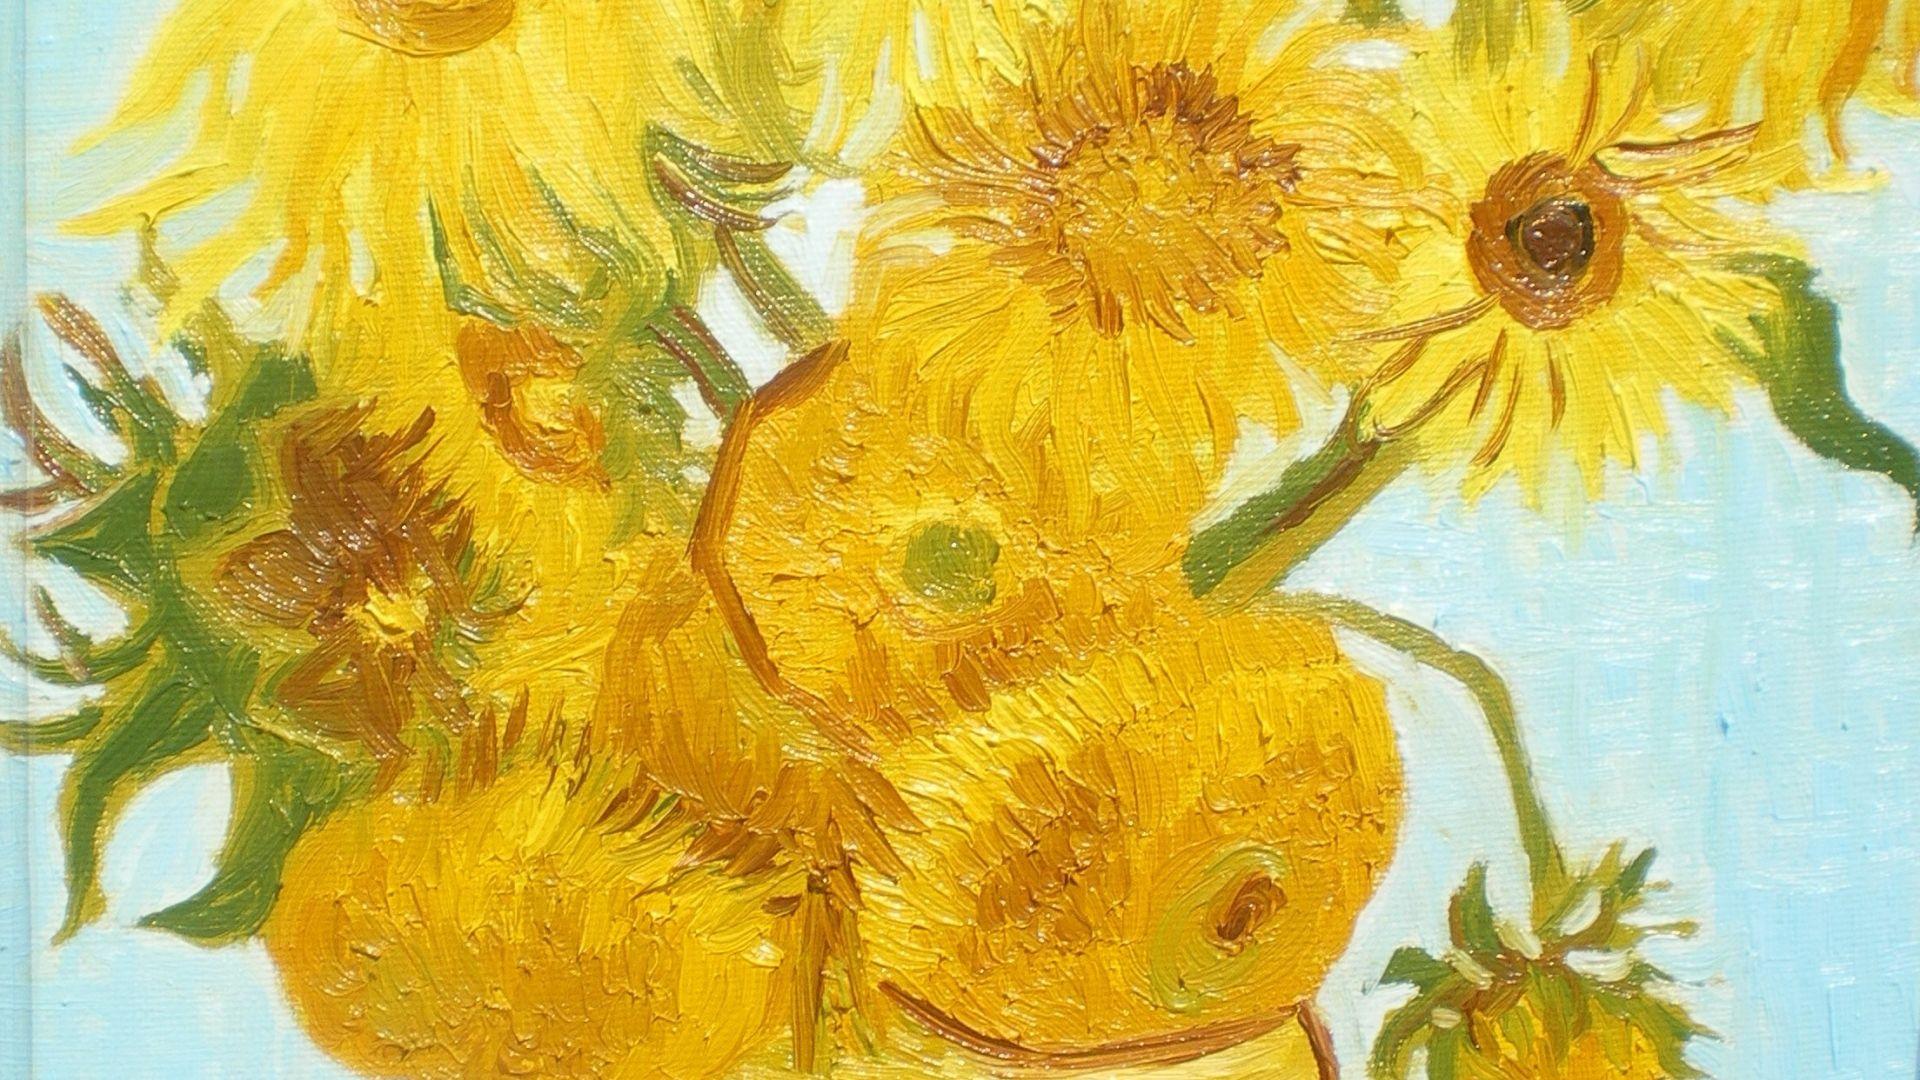 Free Van Gogh Sunflowers Wallpaper For Desktop